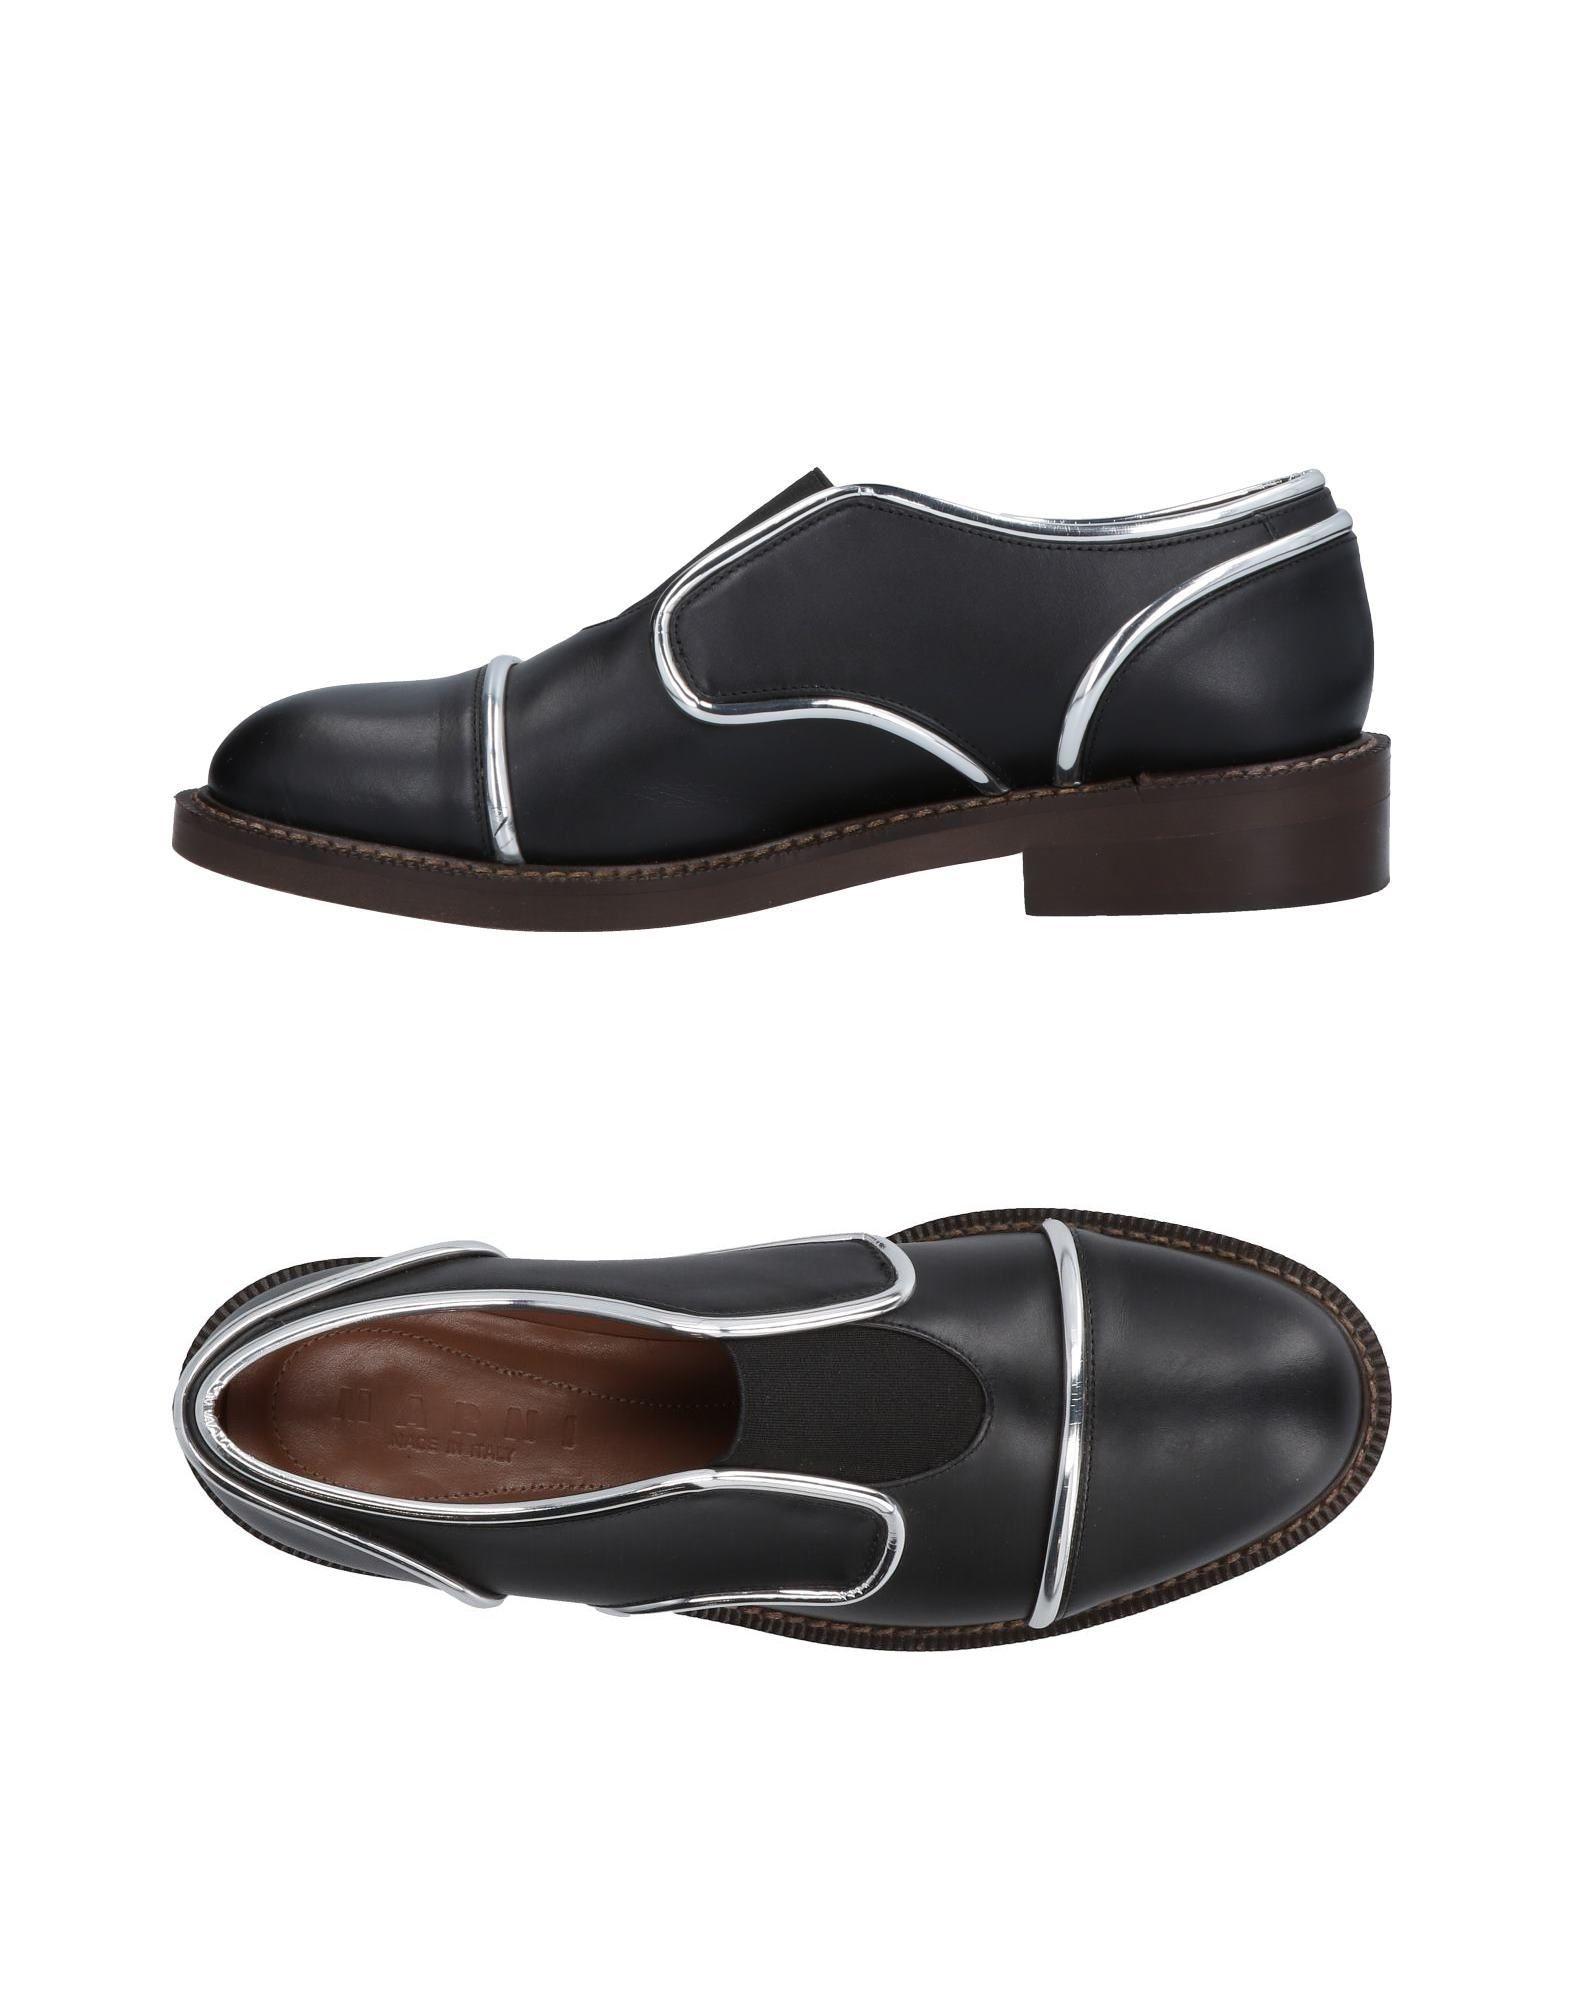 Marni Mokassins Damen  11474430JXGut aussehende strapazierfähige Schuhe